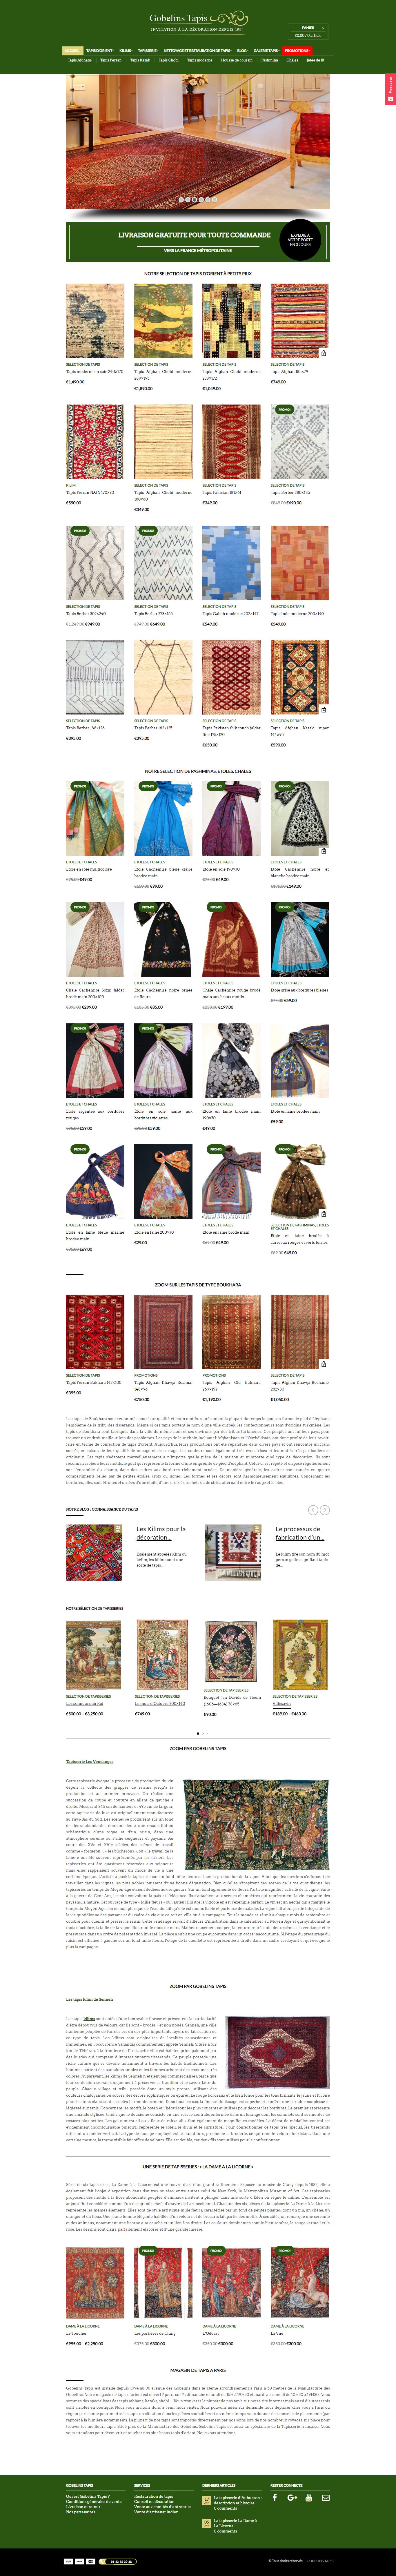 Homa page gobelins-tapis.com